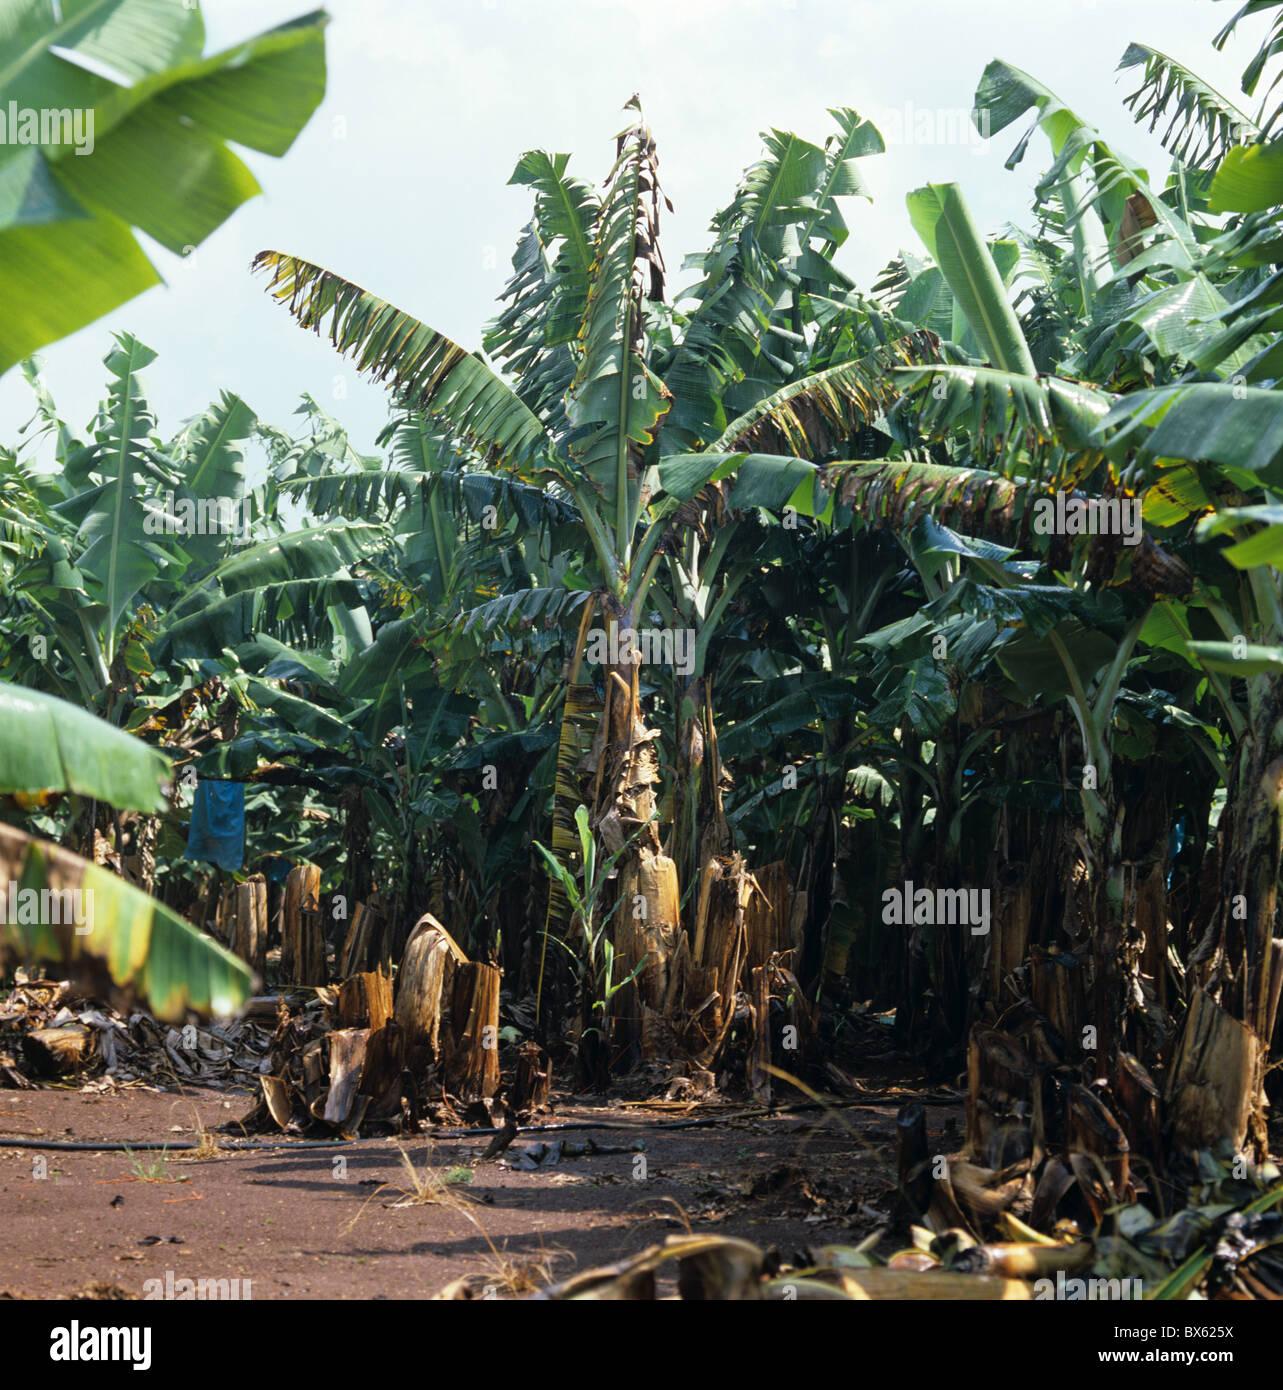 Panama disease (Fusarium oxysporum) devastation in mature South African banana plantation - Stock Image